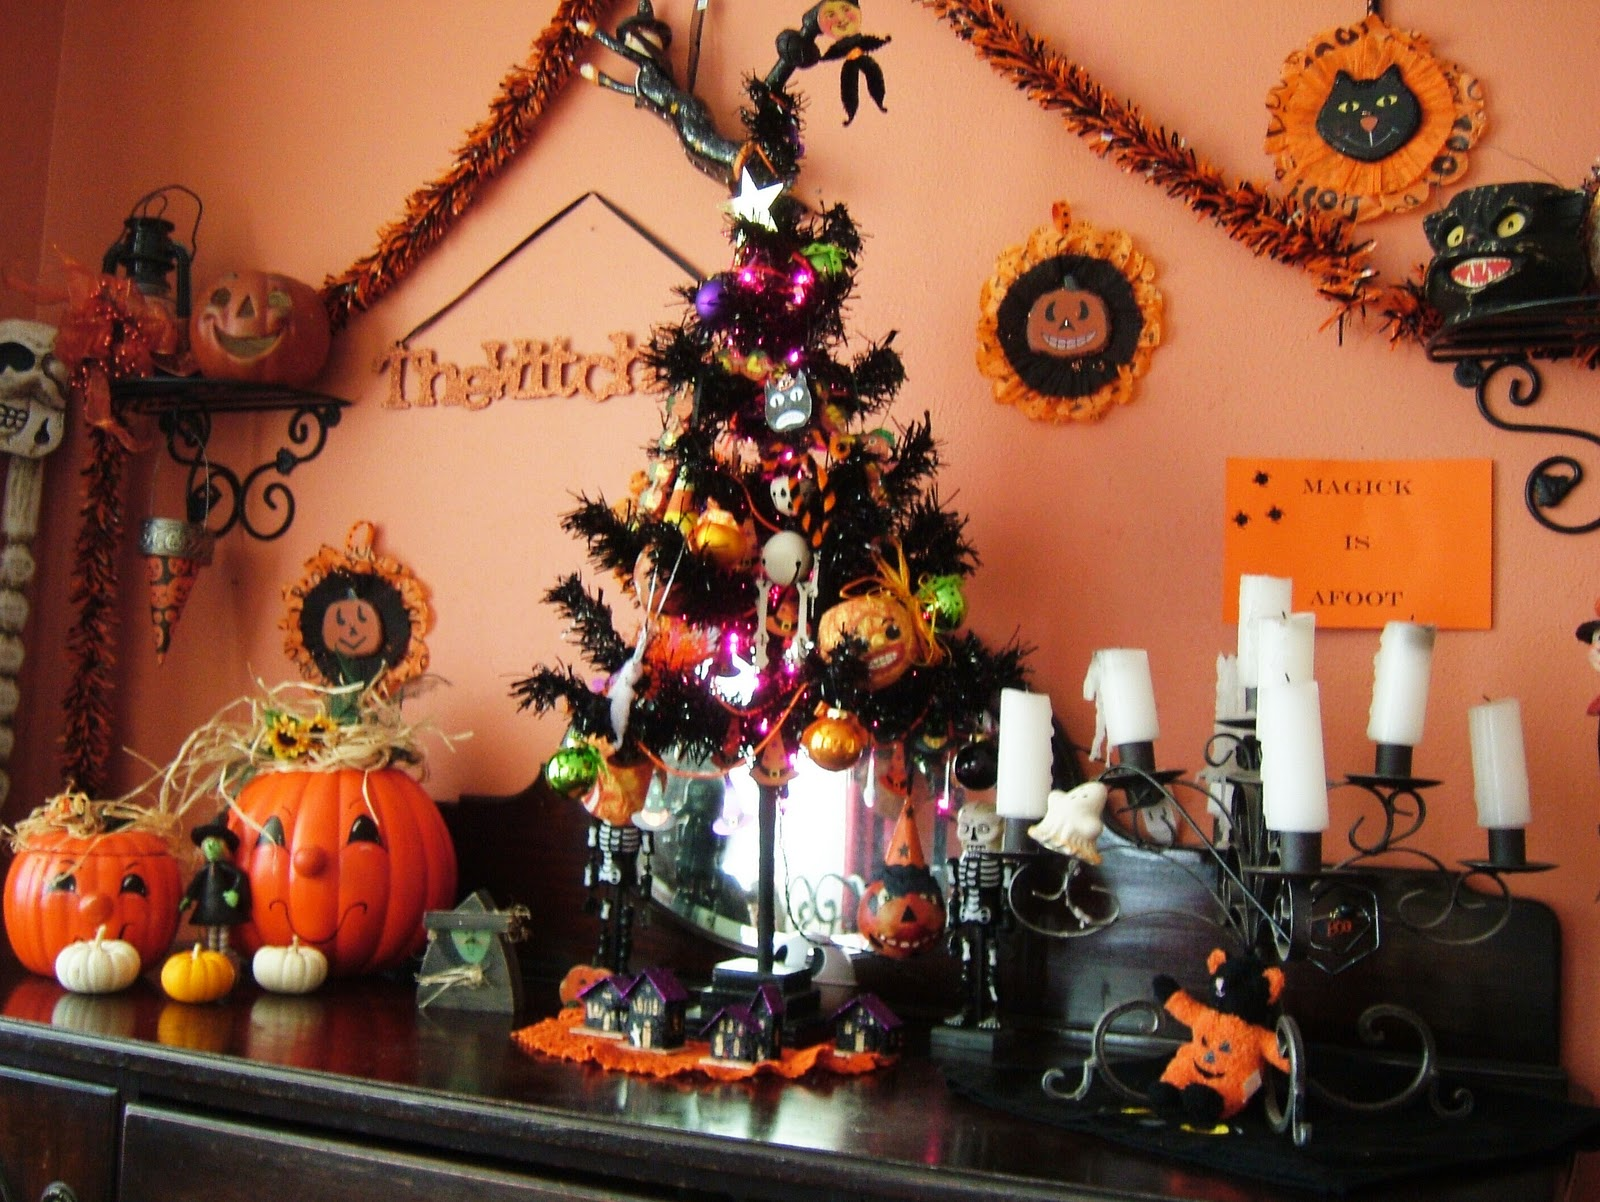 Olde Baggs 'n Stuft Shirts: Halloween Blog #3 .......the